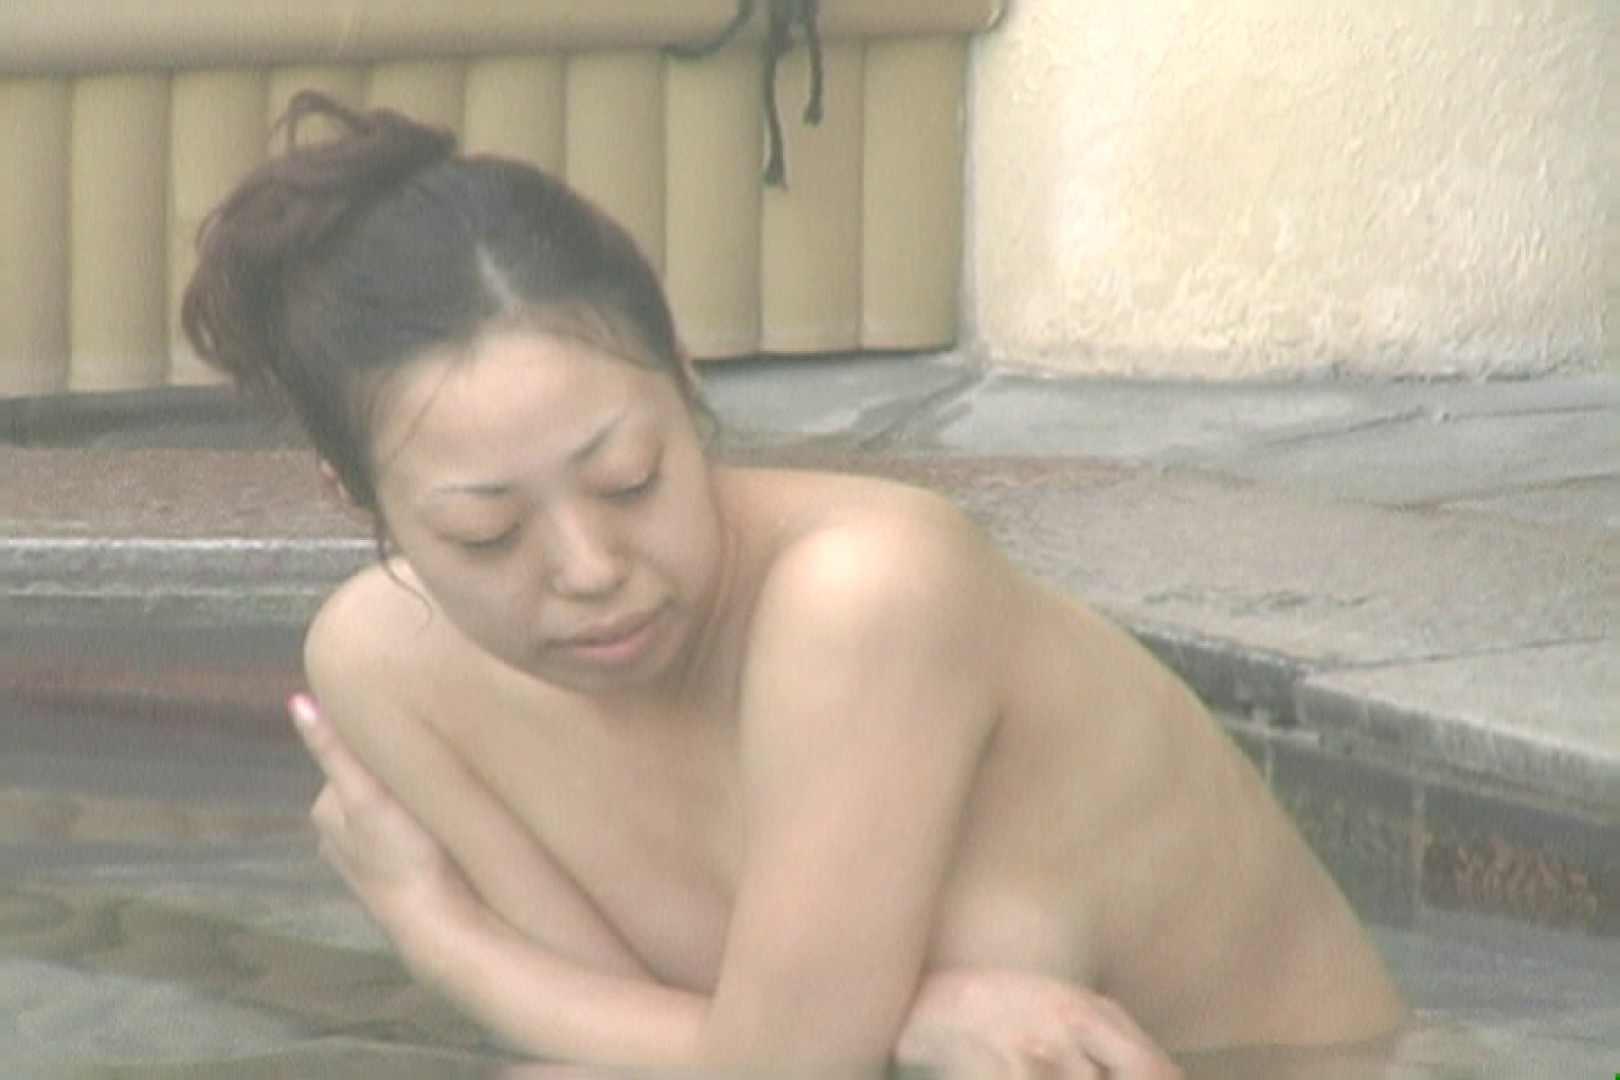 Aquaな露天風呂Vol.626 OLセックス  92画像 27